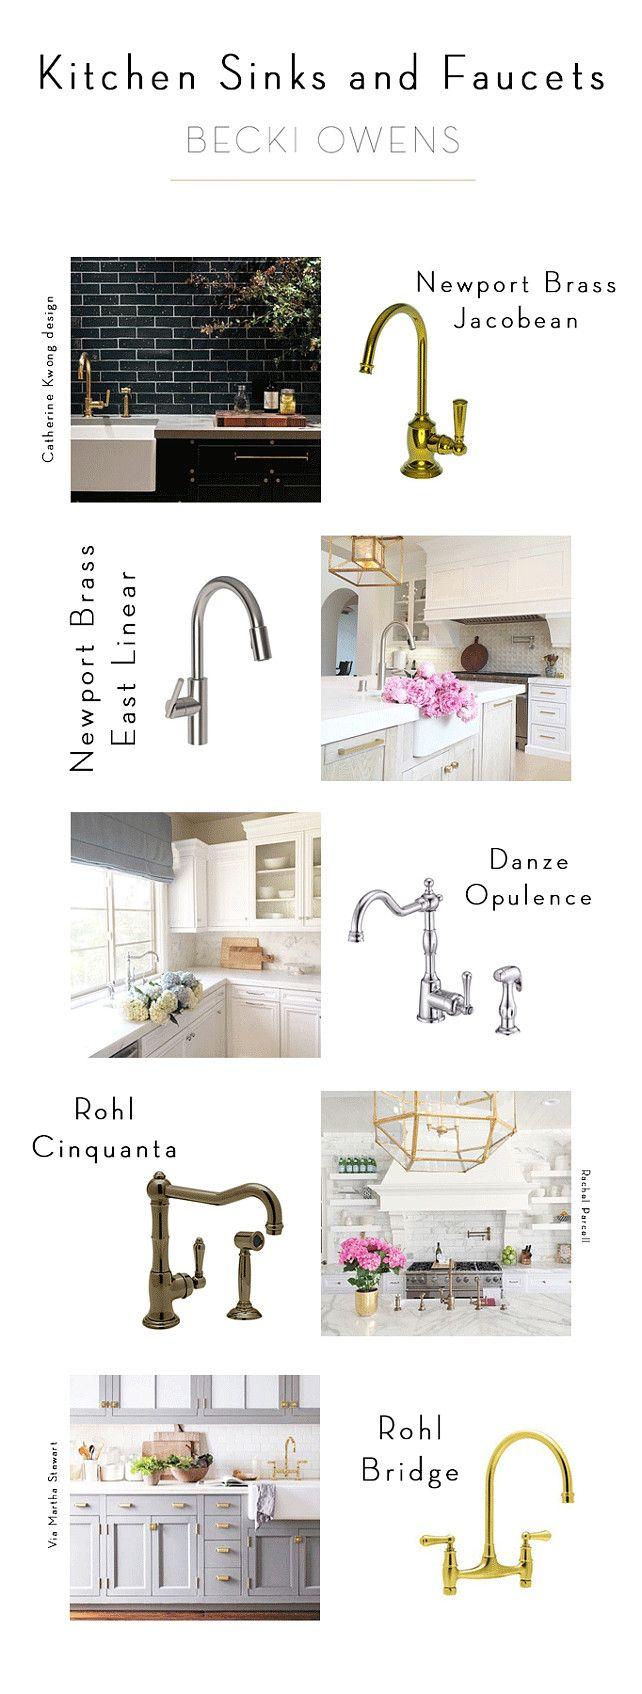 Blanco zerox 700 u stainless steel undermount sink - Kitchen Sinks Kohler Dickinson Apron Front Kohler Whitehaven Apron Front Blanco